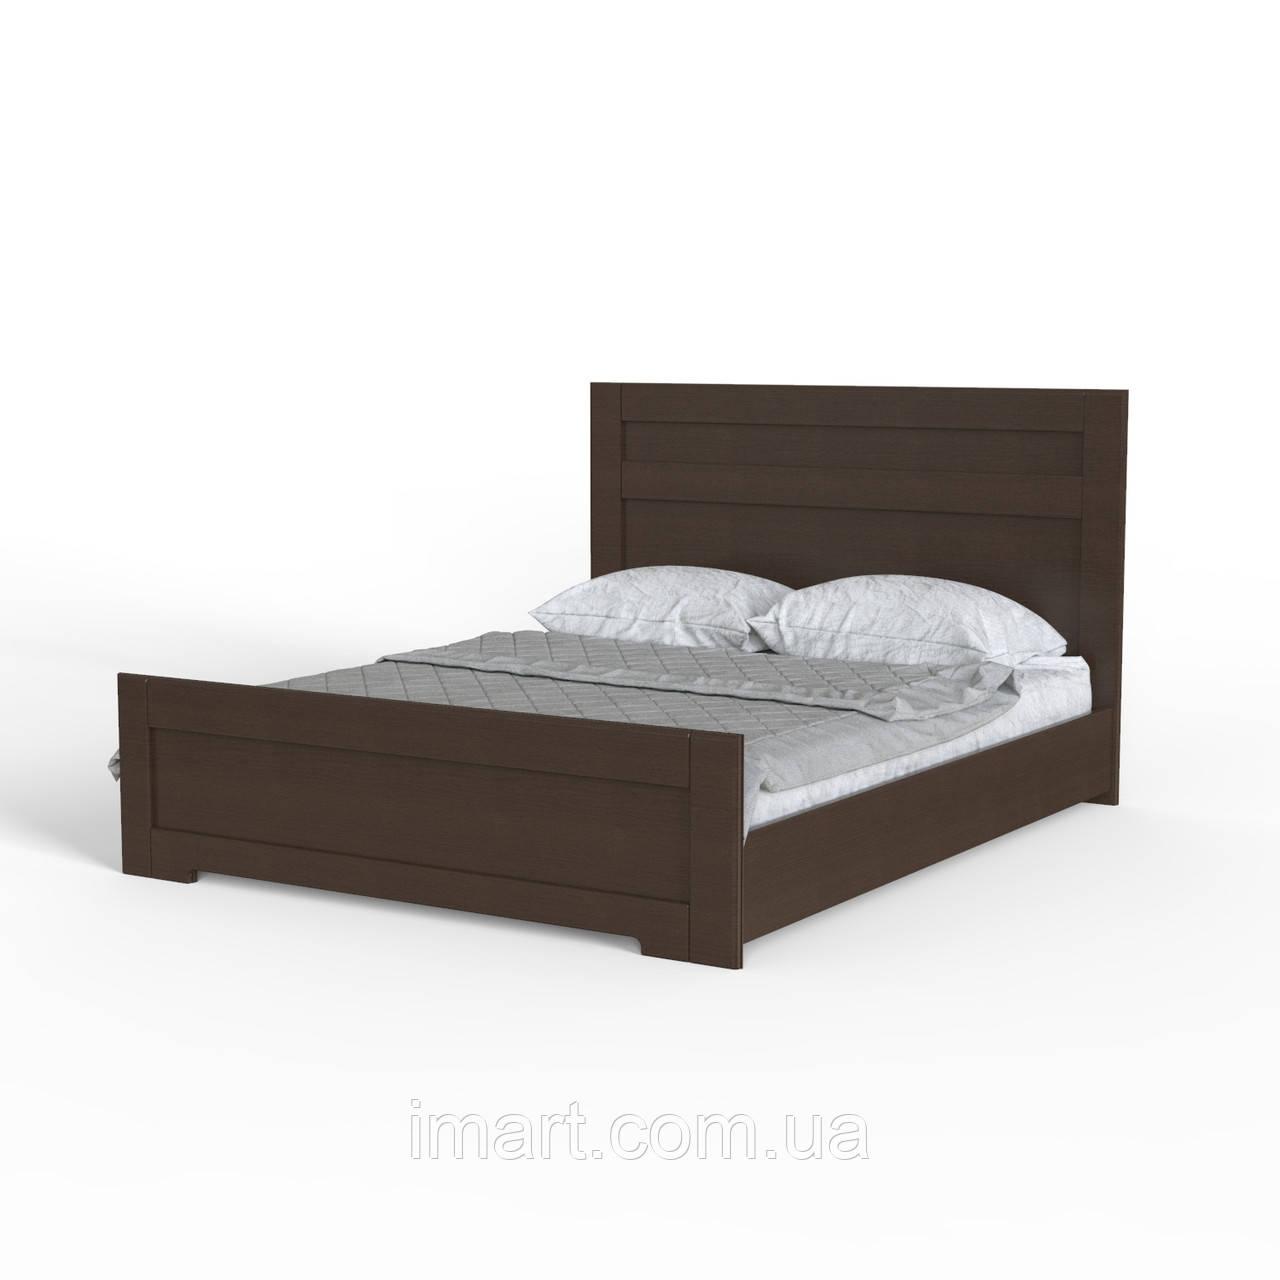 Ліжко Light Венге (1800*2000)